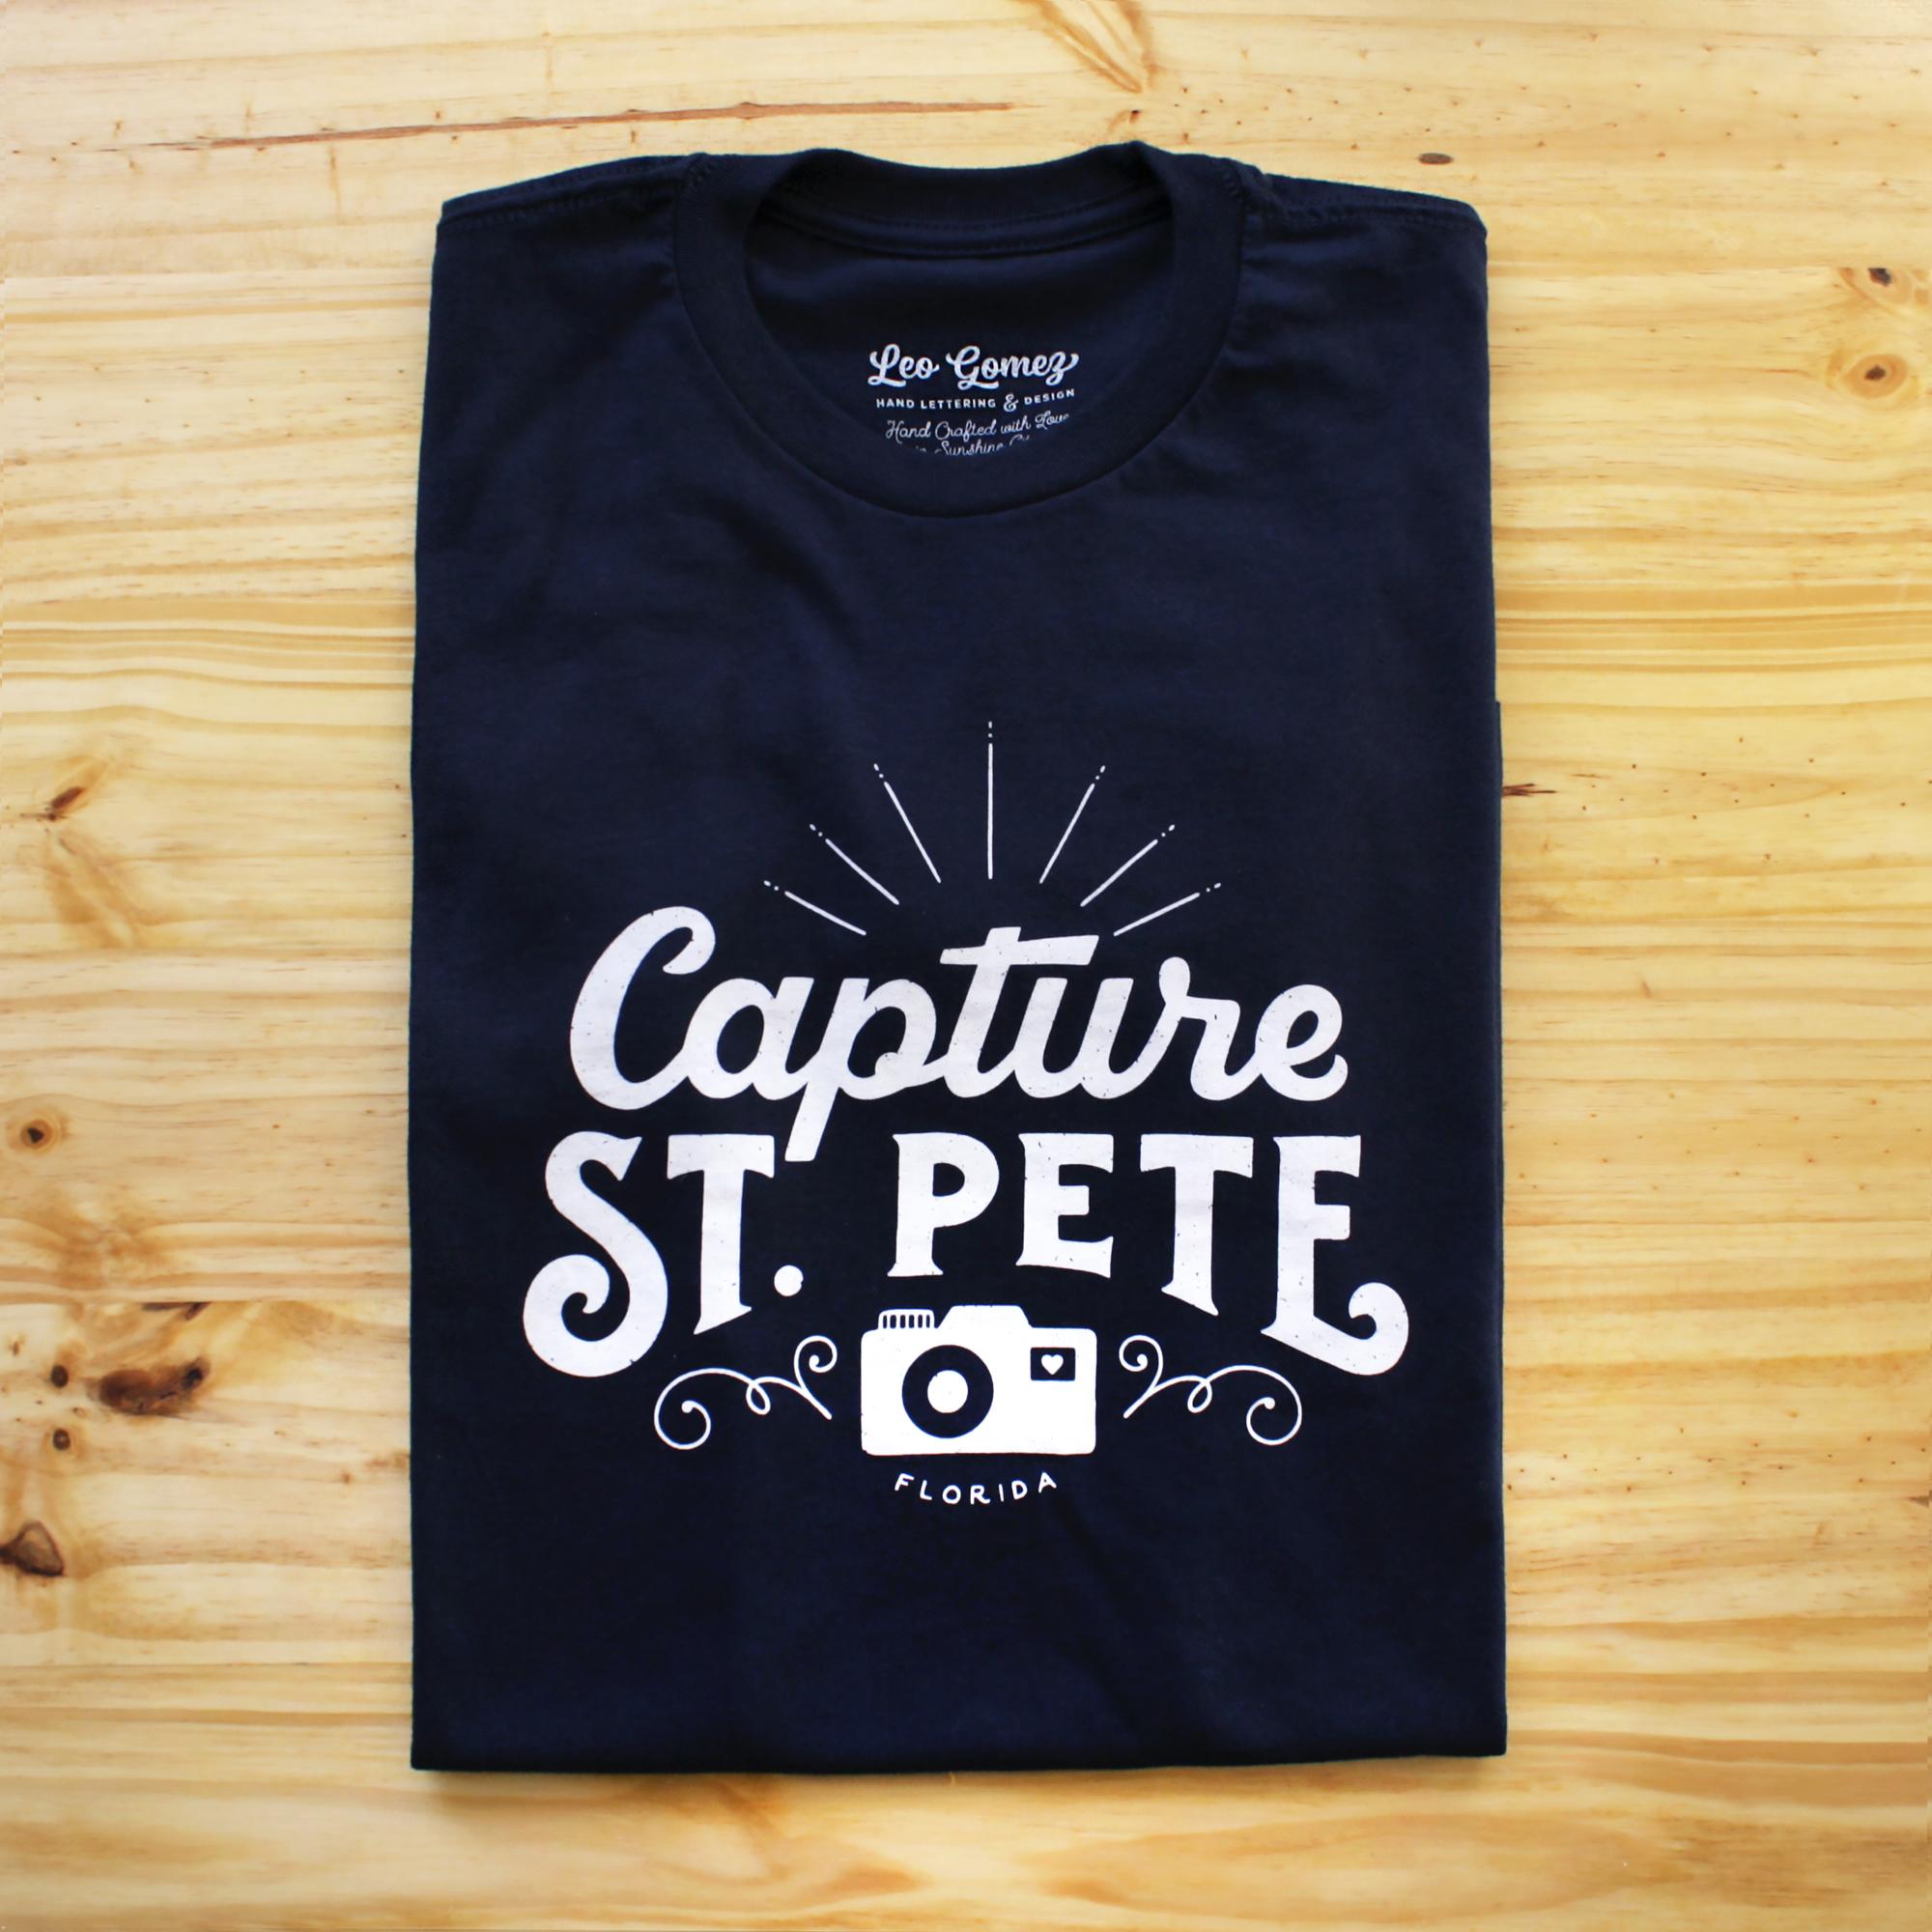 Leo-gomez-studio-capture-st-pete-tshirt-01